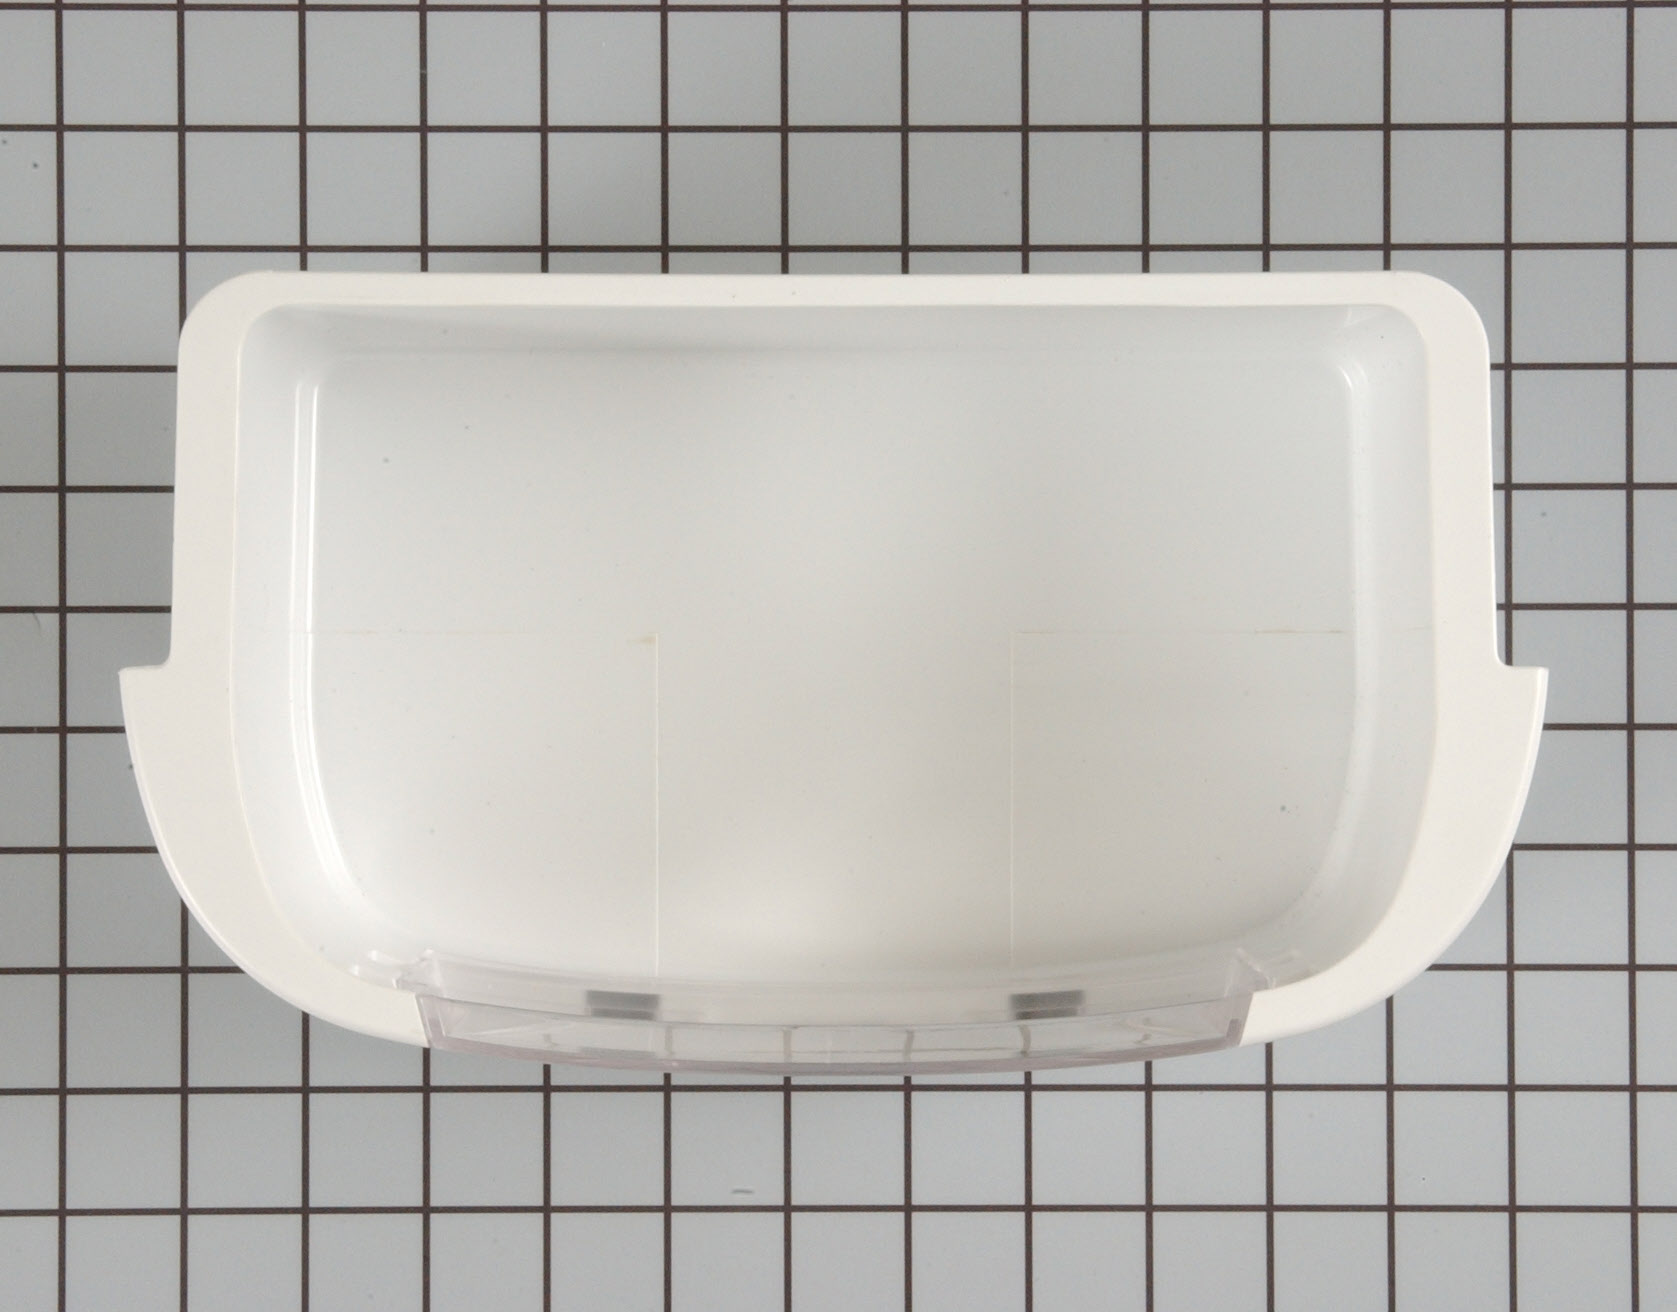 WP67004041 Maytag Refrigerator Part -Door Shelf Bin